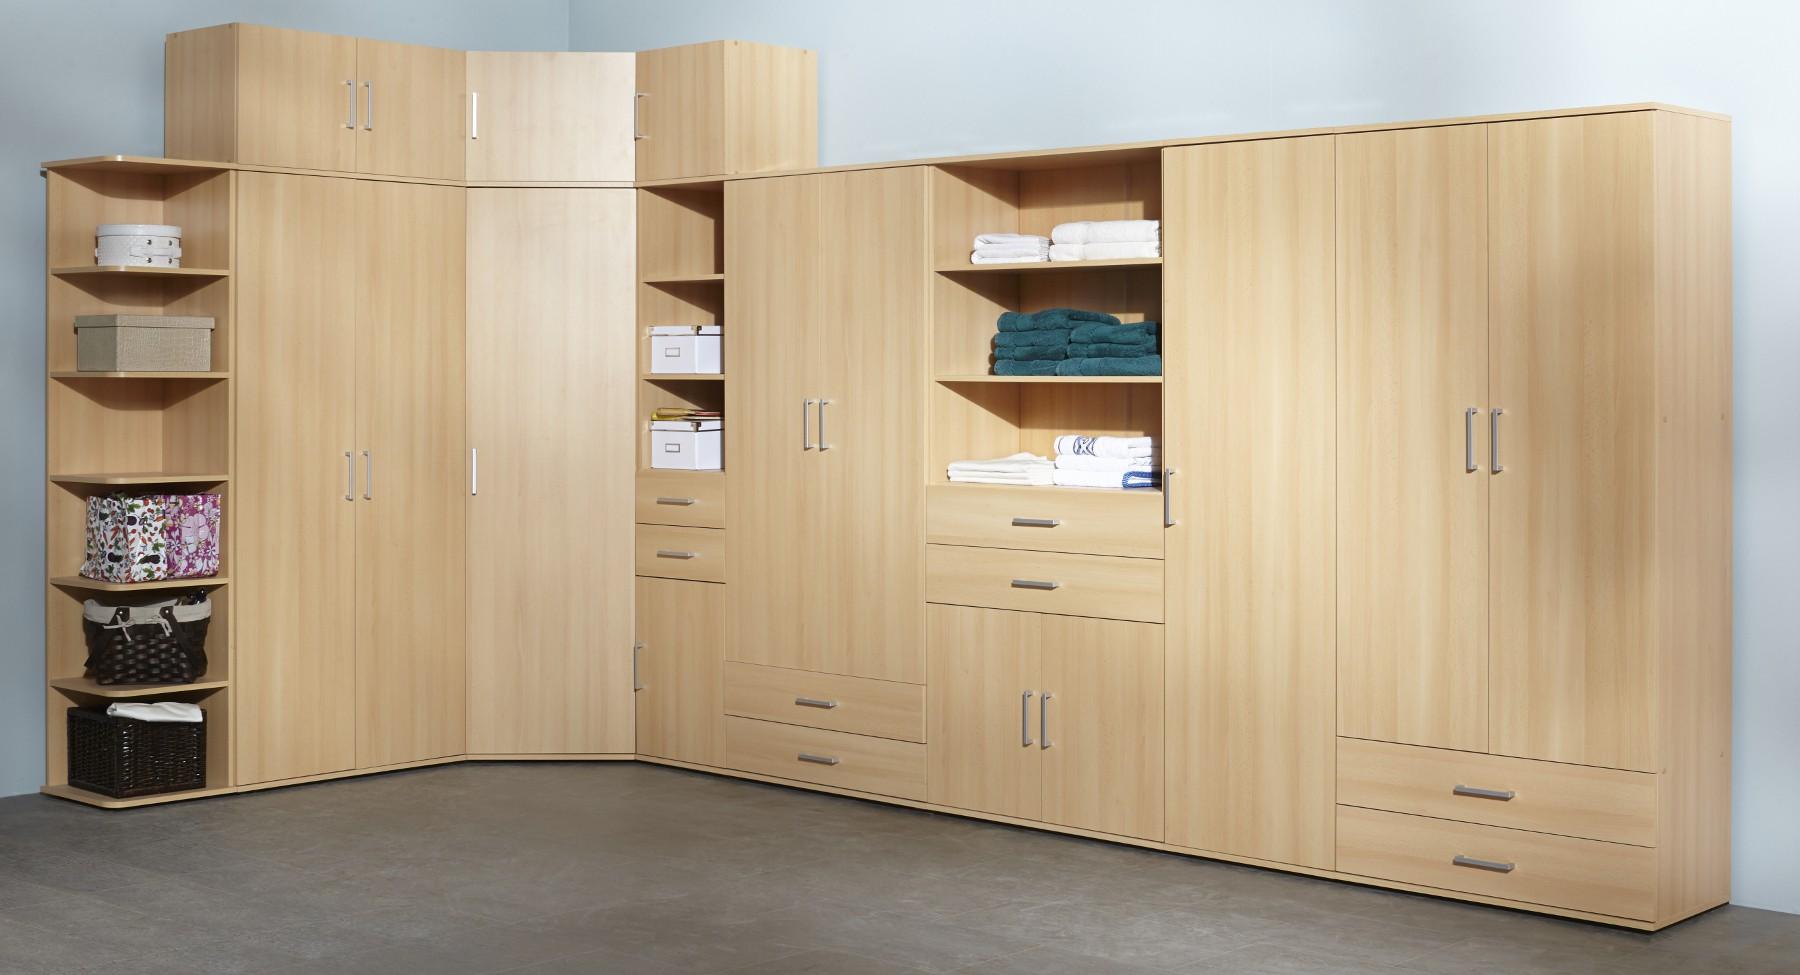 neu staubsauger besenschrank mehrzweckschrank putzschrank. Black Bedroom Furniture Sets. Home Design Ideas